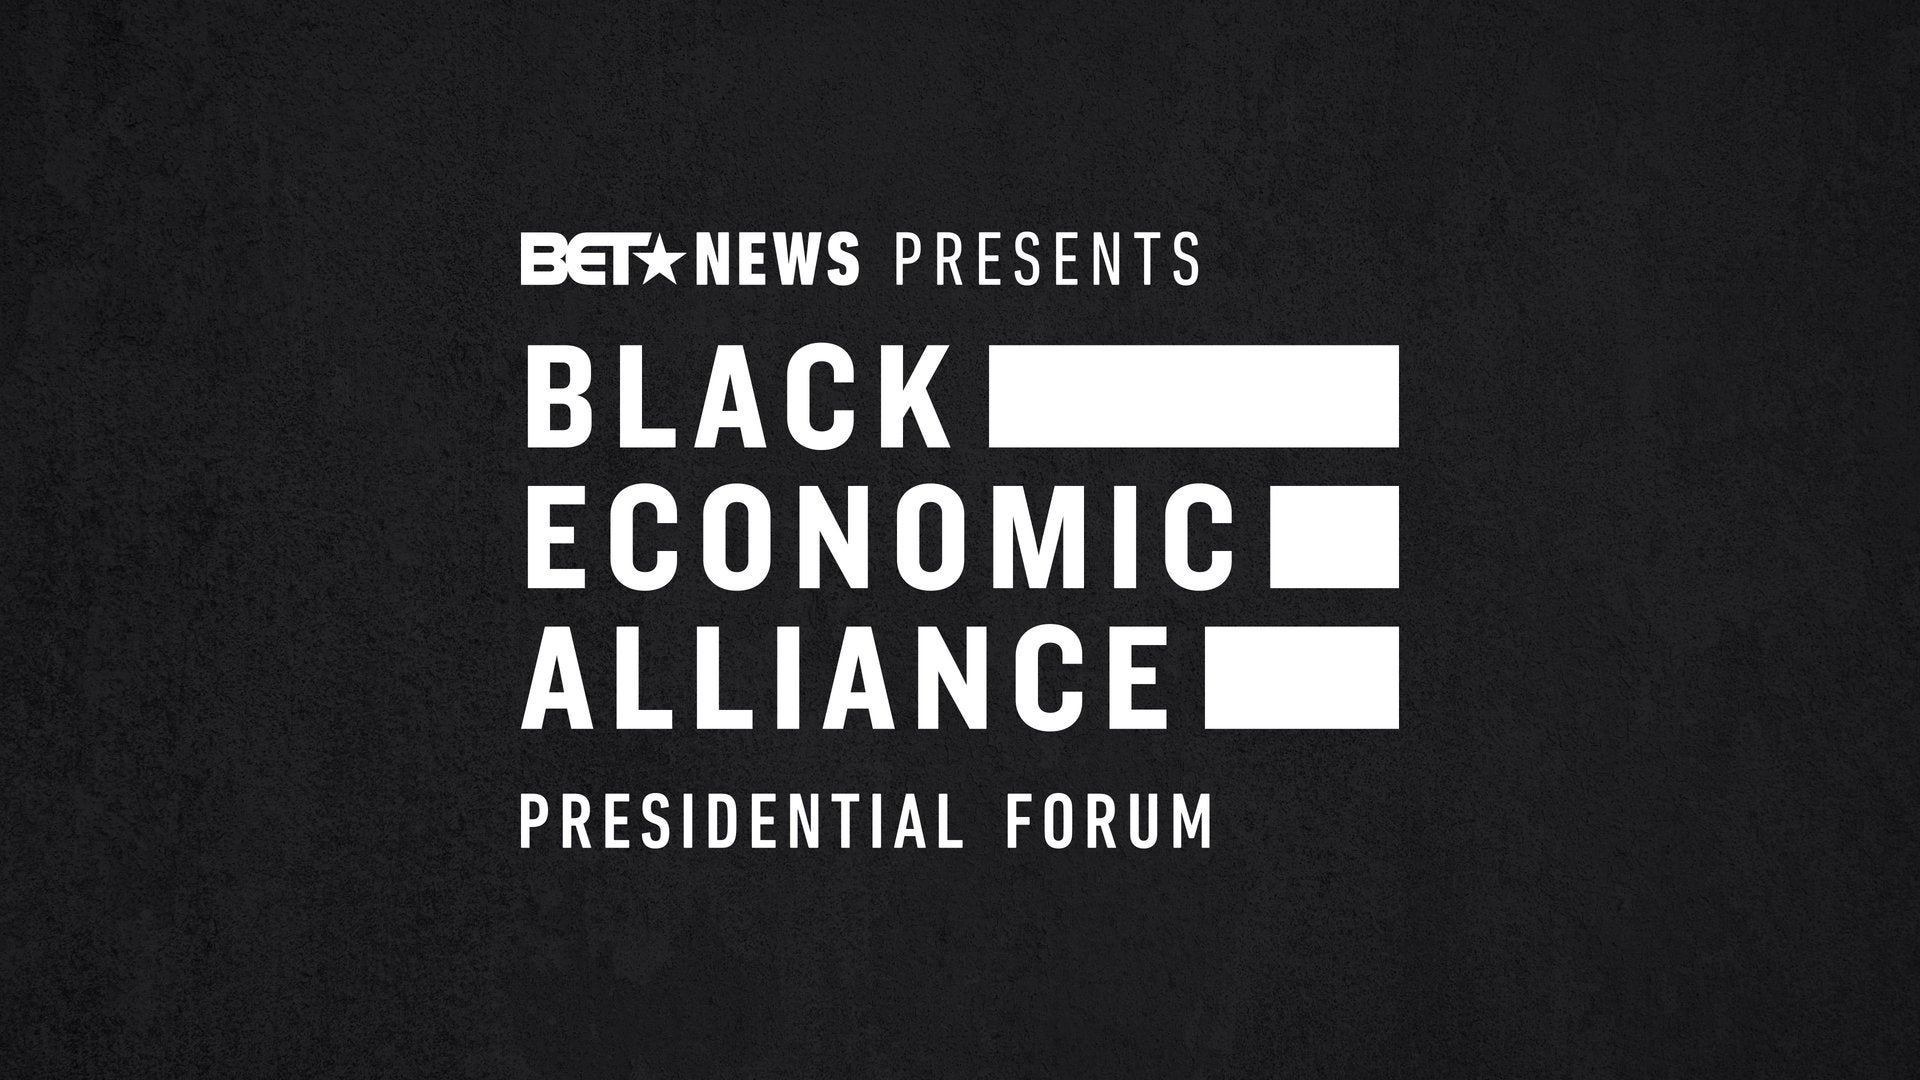 Black Economic Alliance Forum